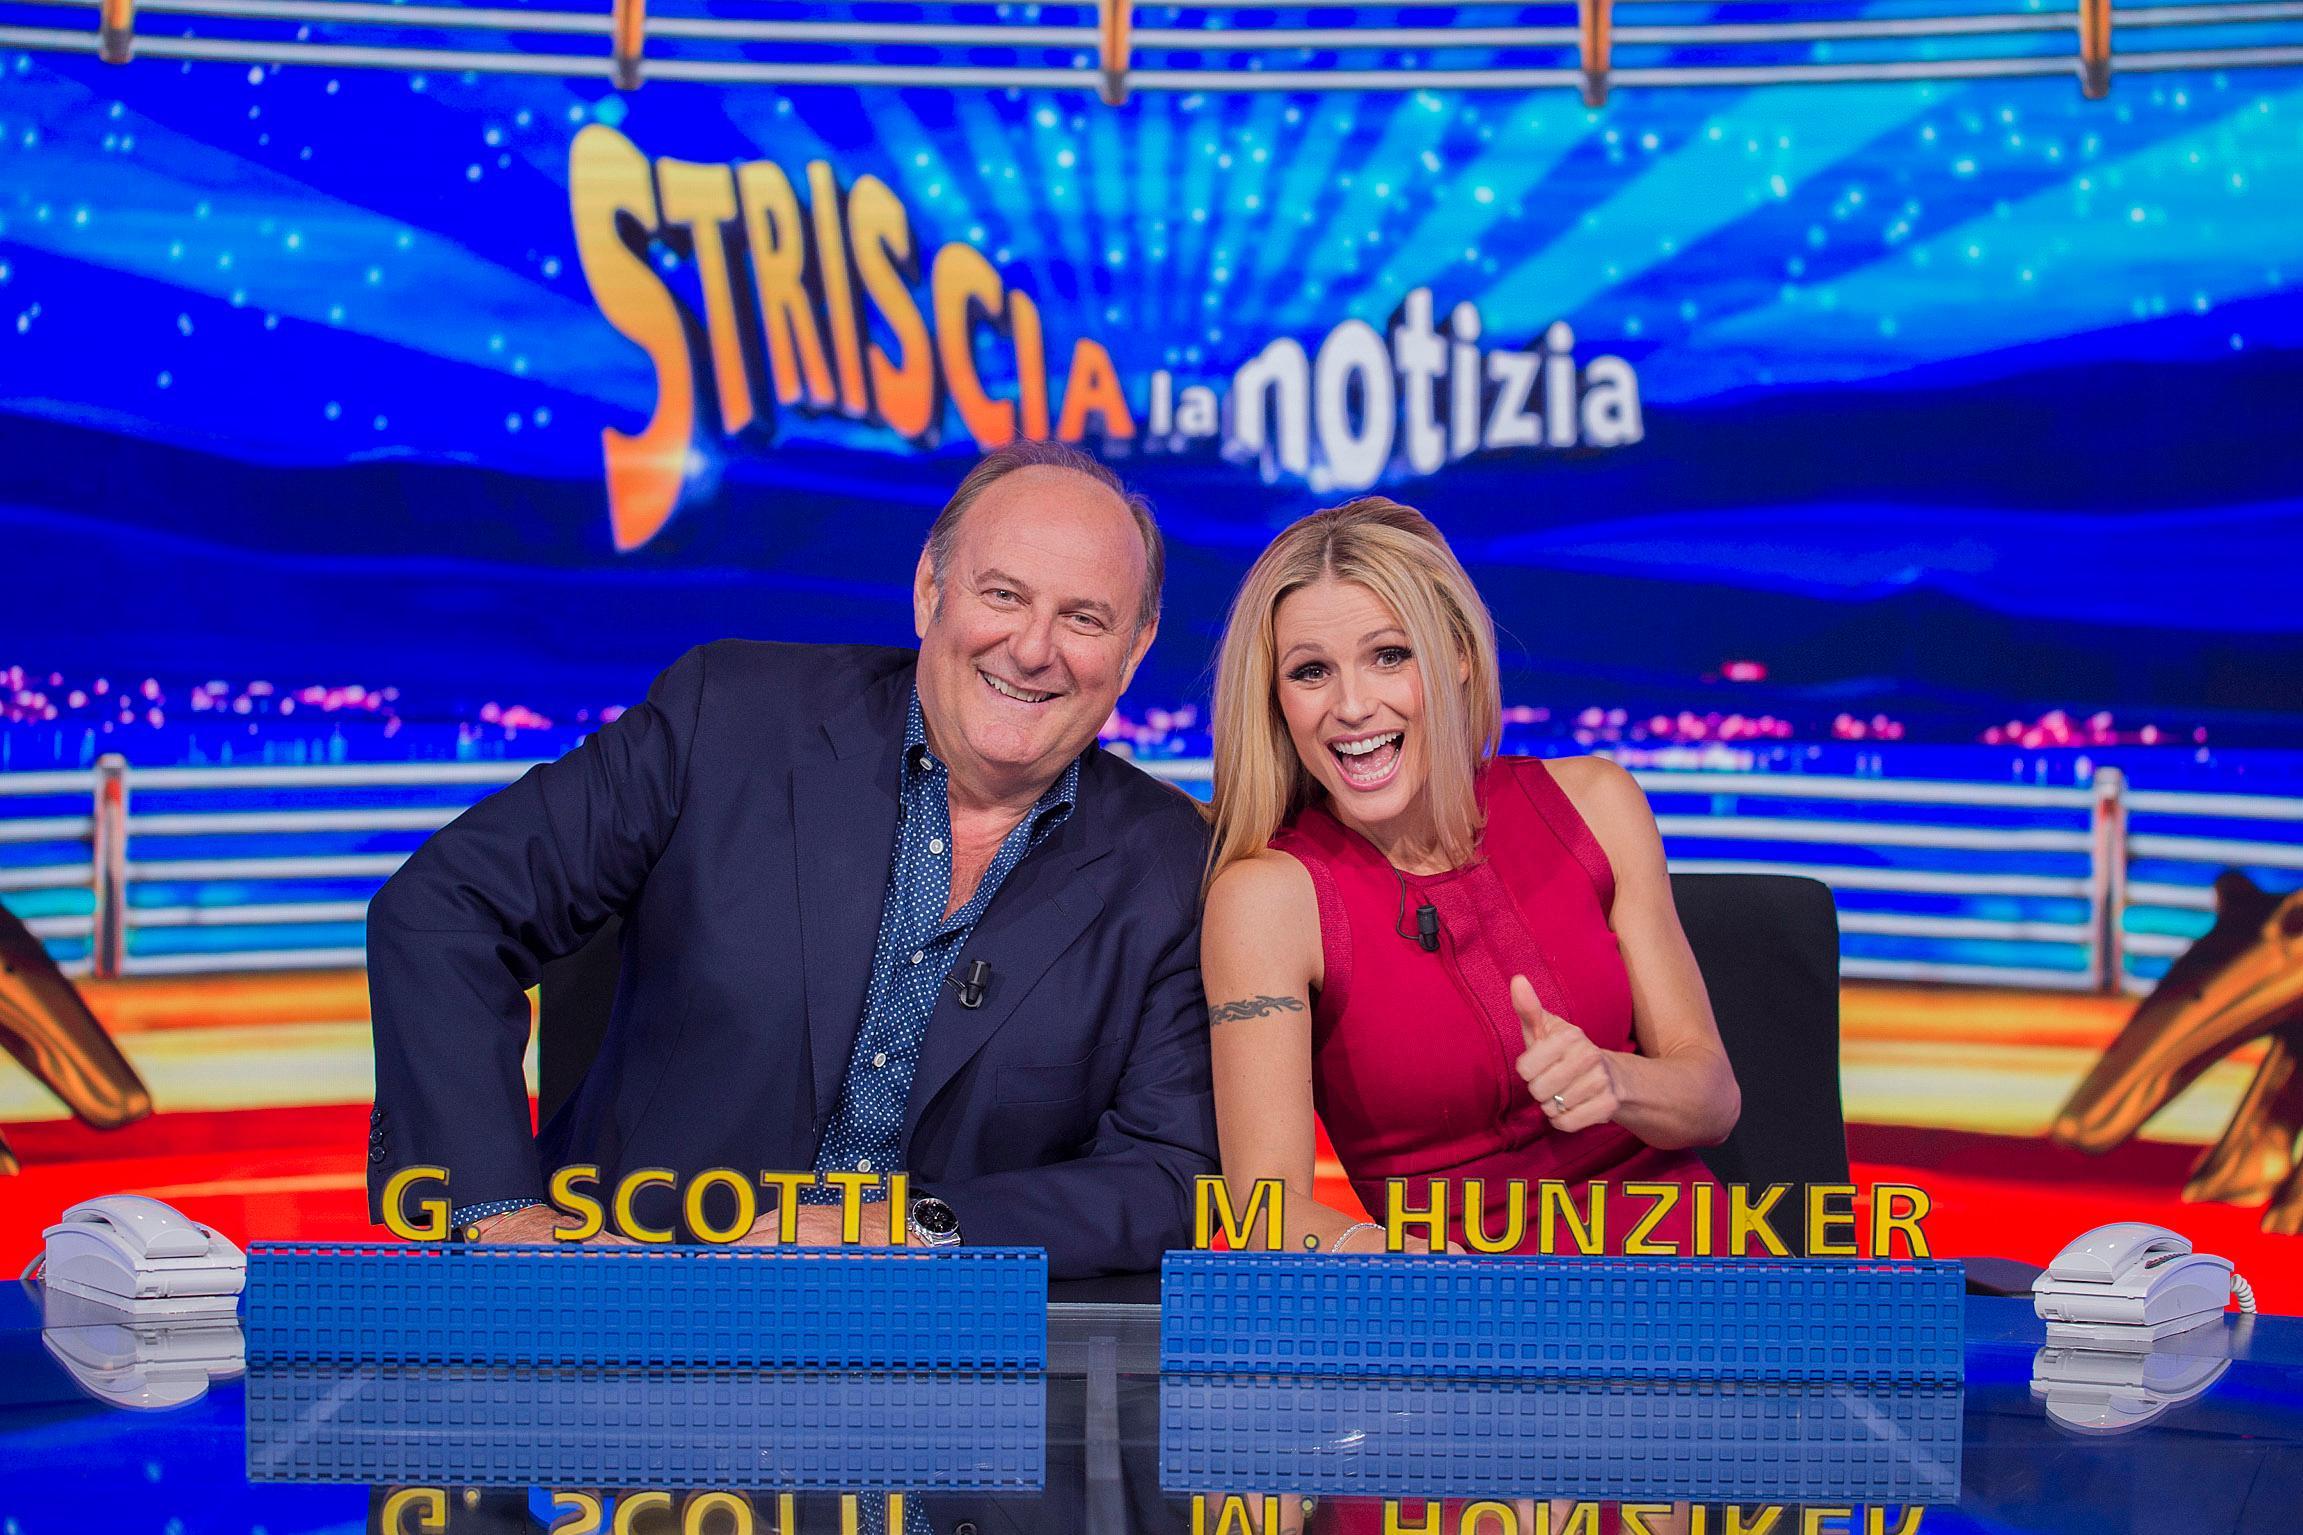 Scotti torna a Striscia con Hunziker